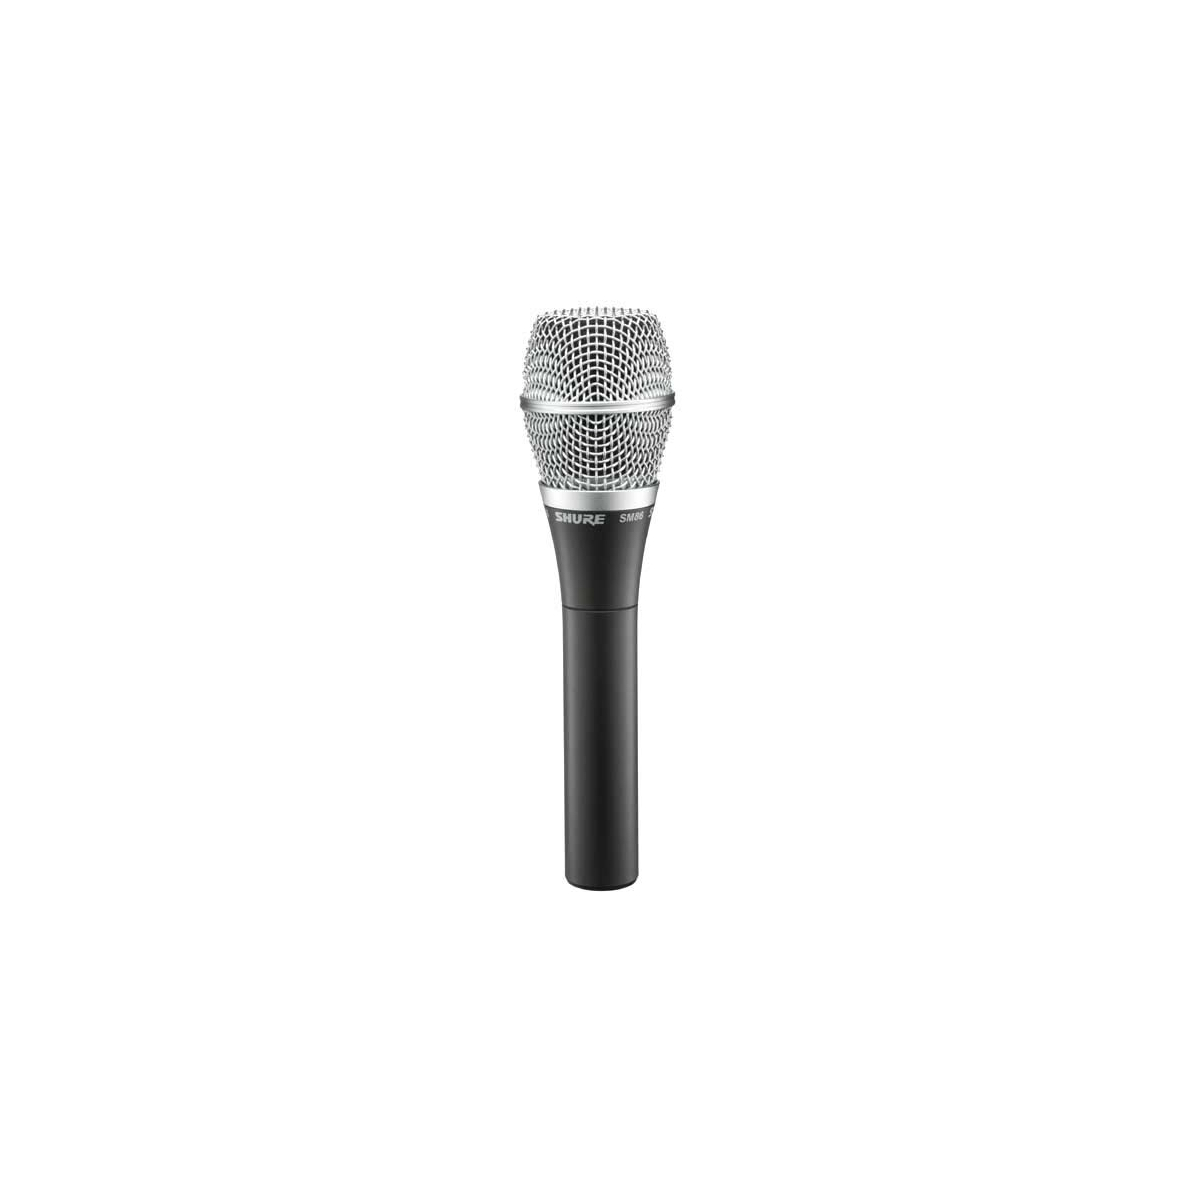 Micros chant - Shure - SM86